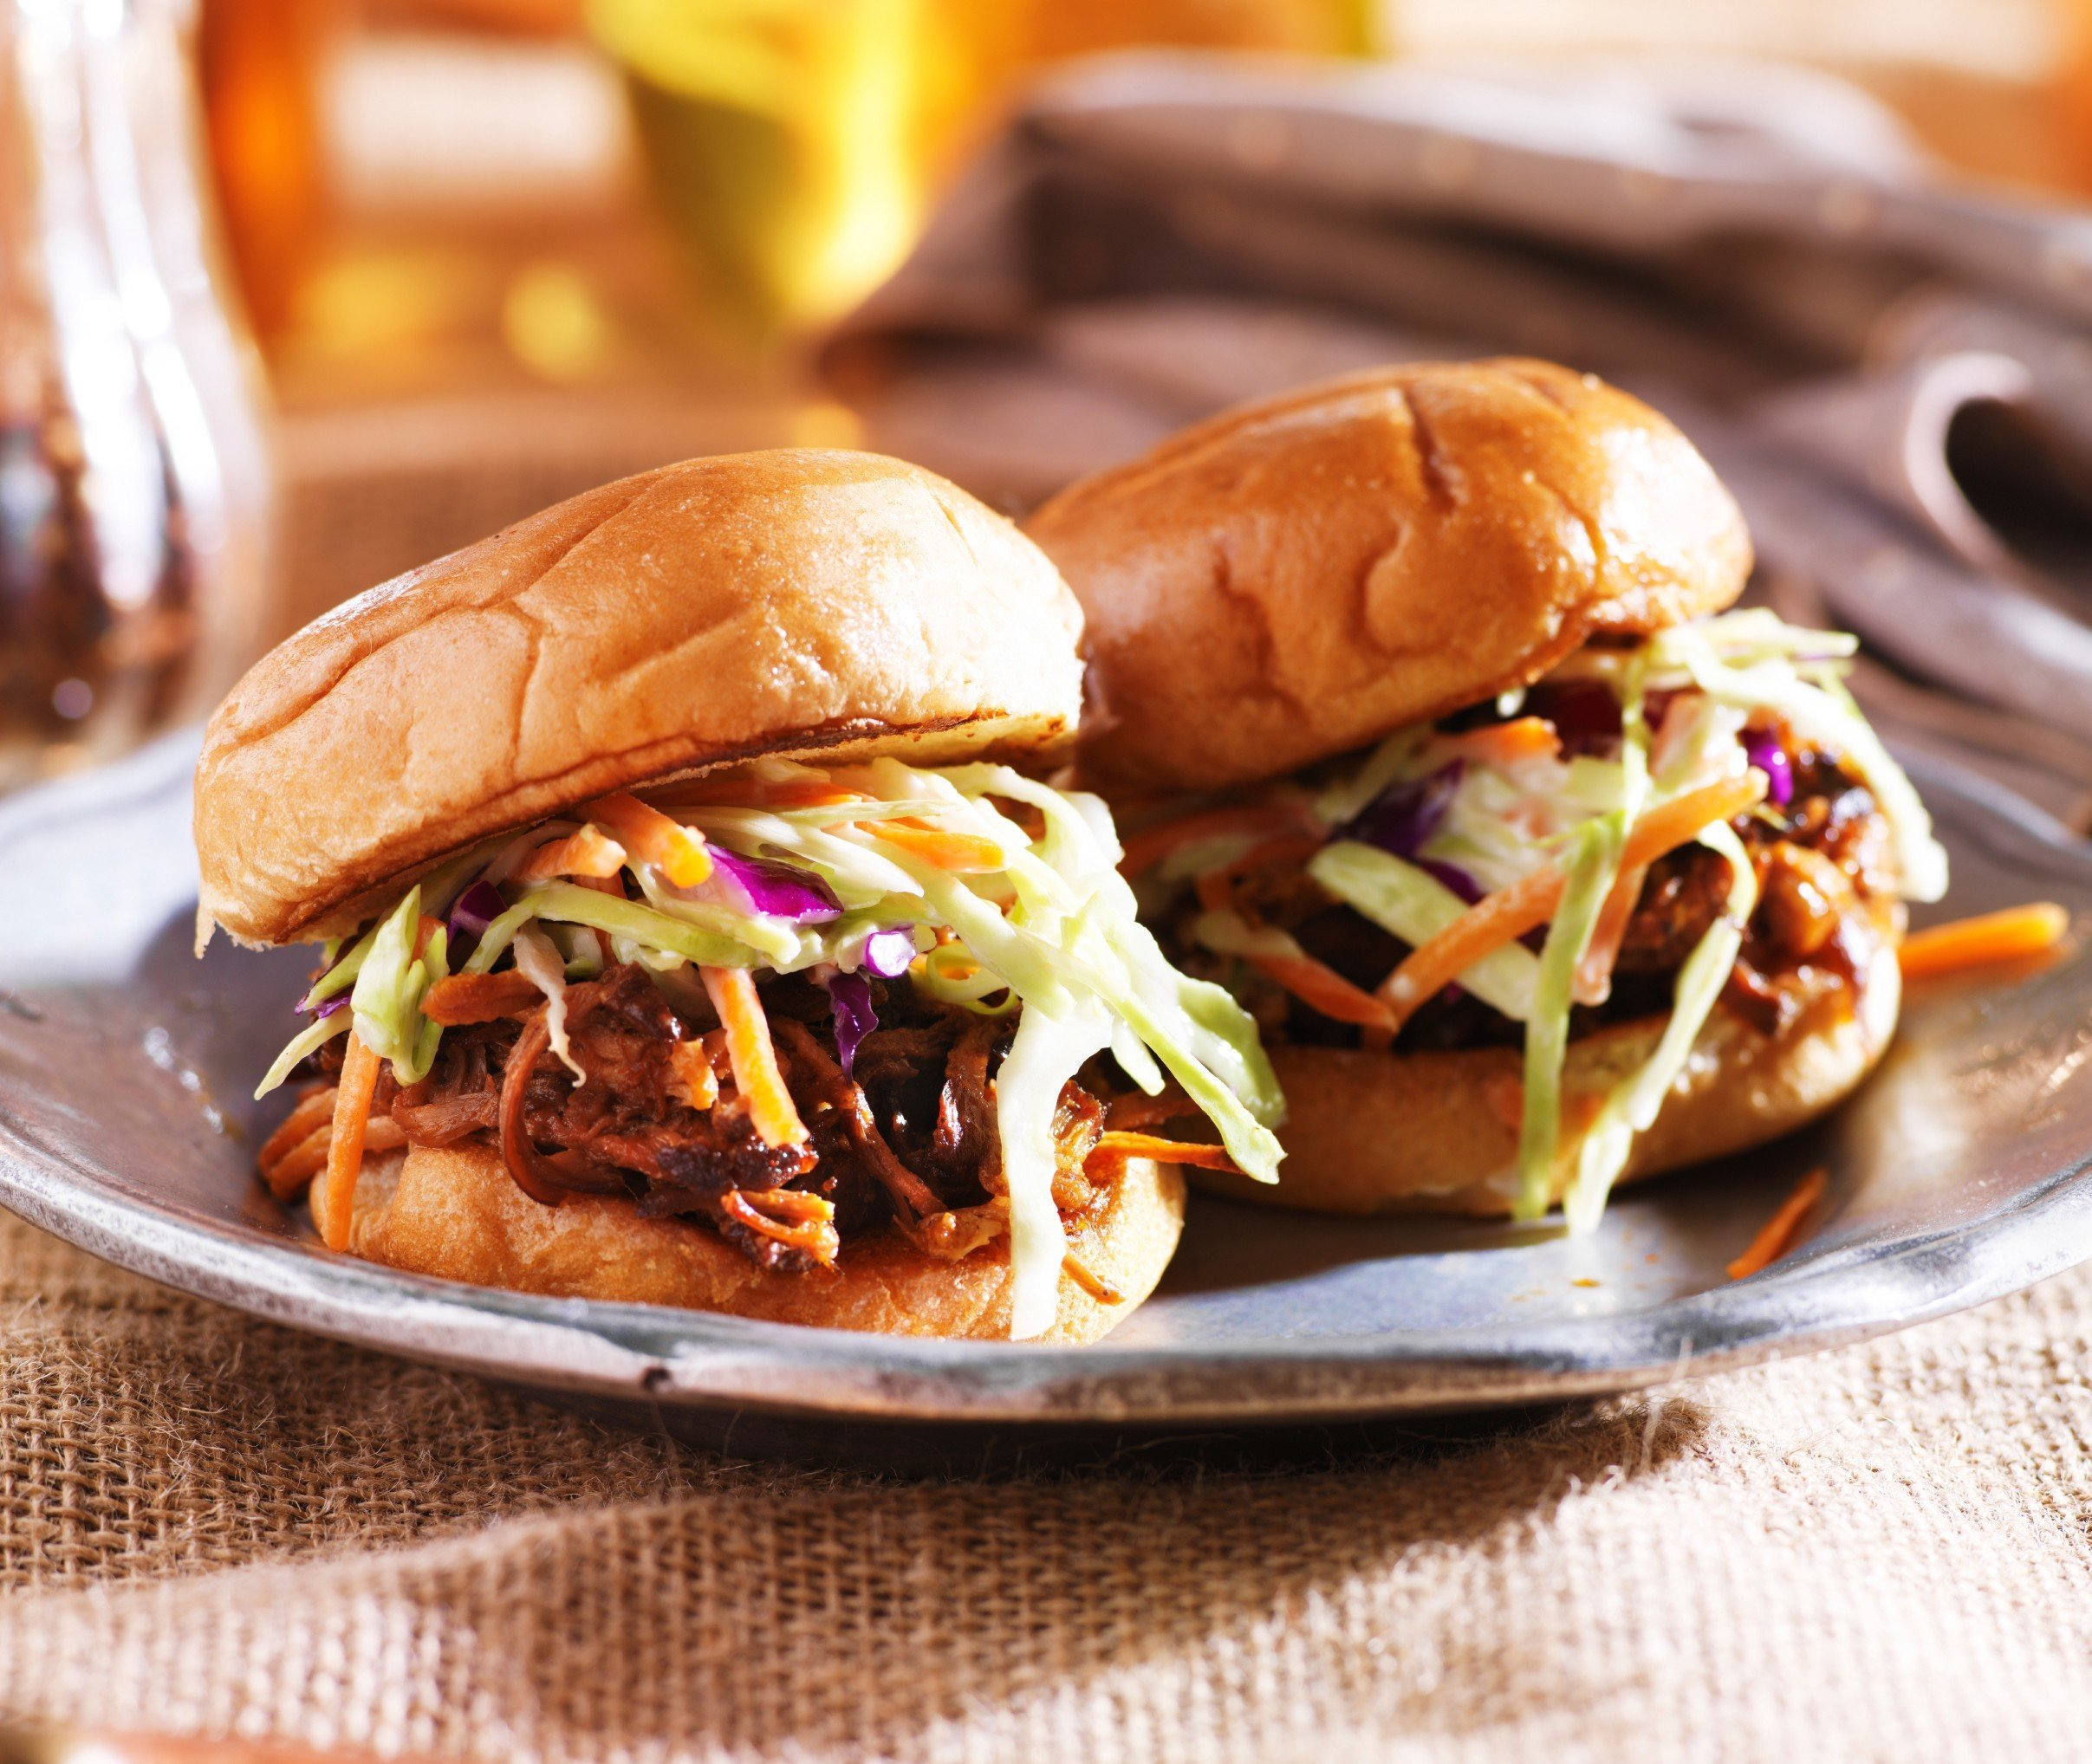 Food + Drink food dish plate sandwich pulled pork meat slider cuisine sloppy joe cheeseburger meal hamburger breakfast produce cheesesteak snack food